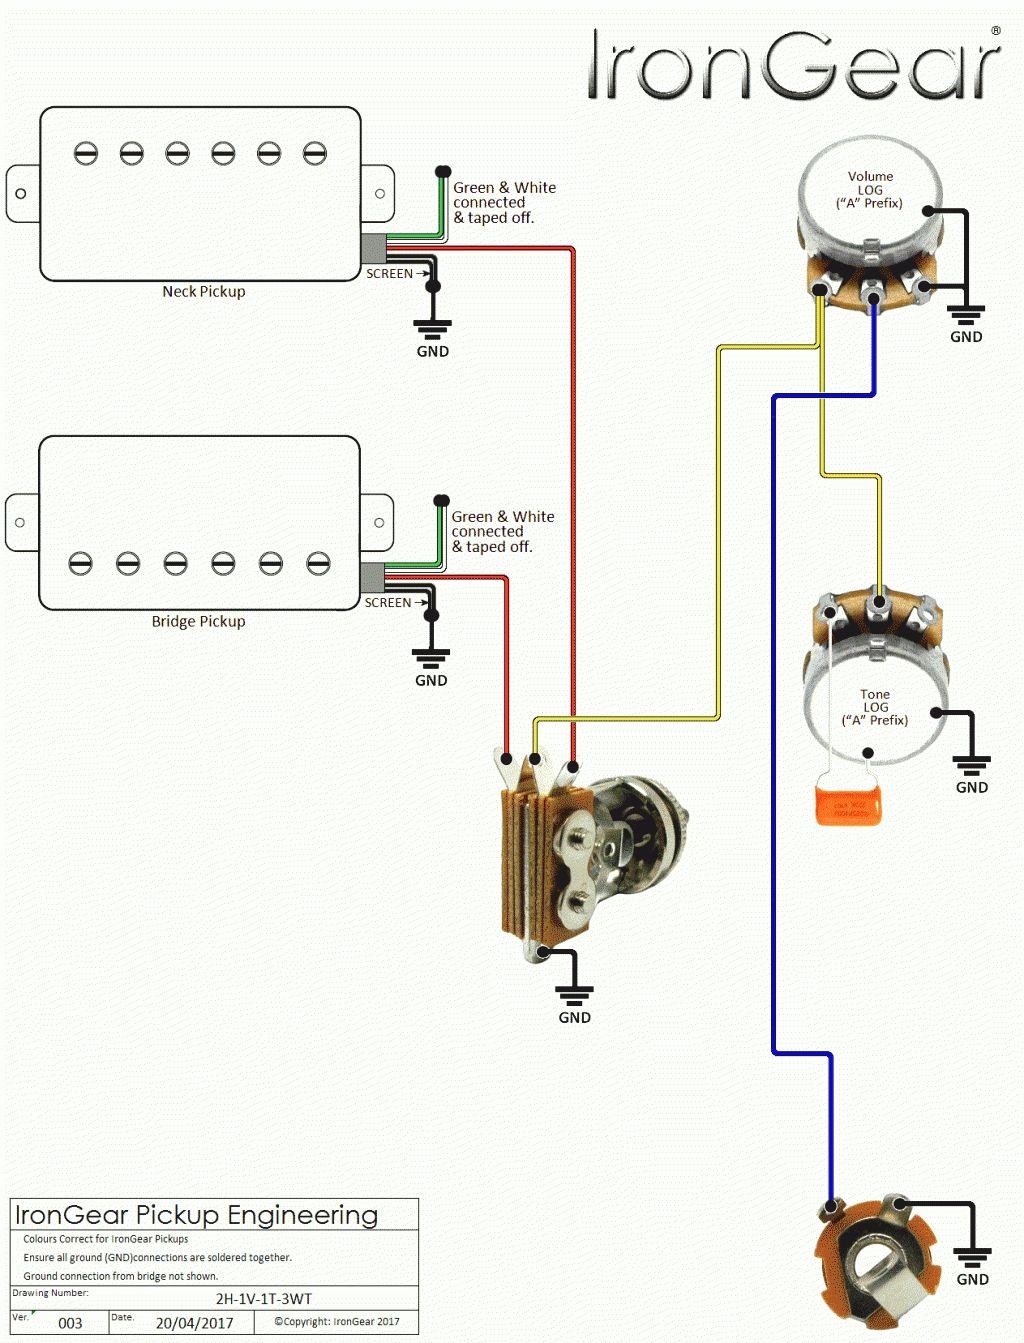 YY_6773] Electric Bass Guitar Wiring Diagrams Schematic WiringAnal Diog Bocep Mohammedshrine Librar Wiring 101